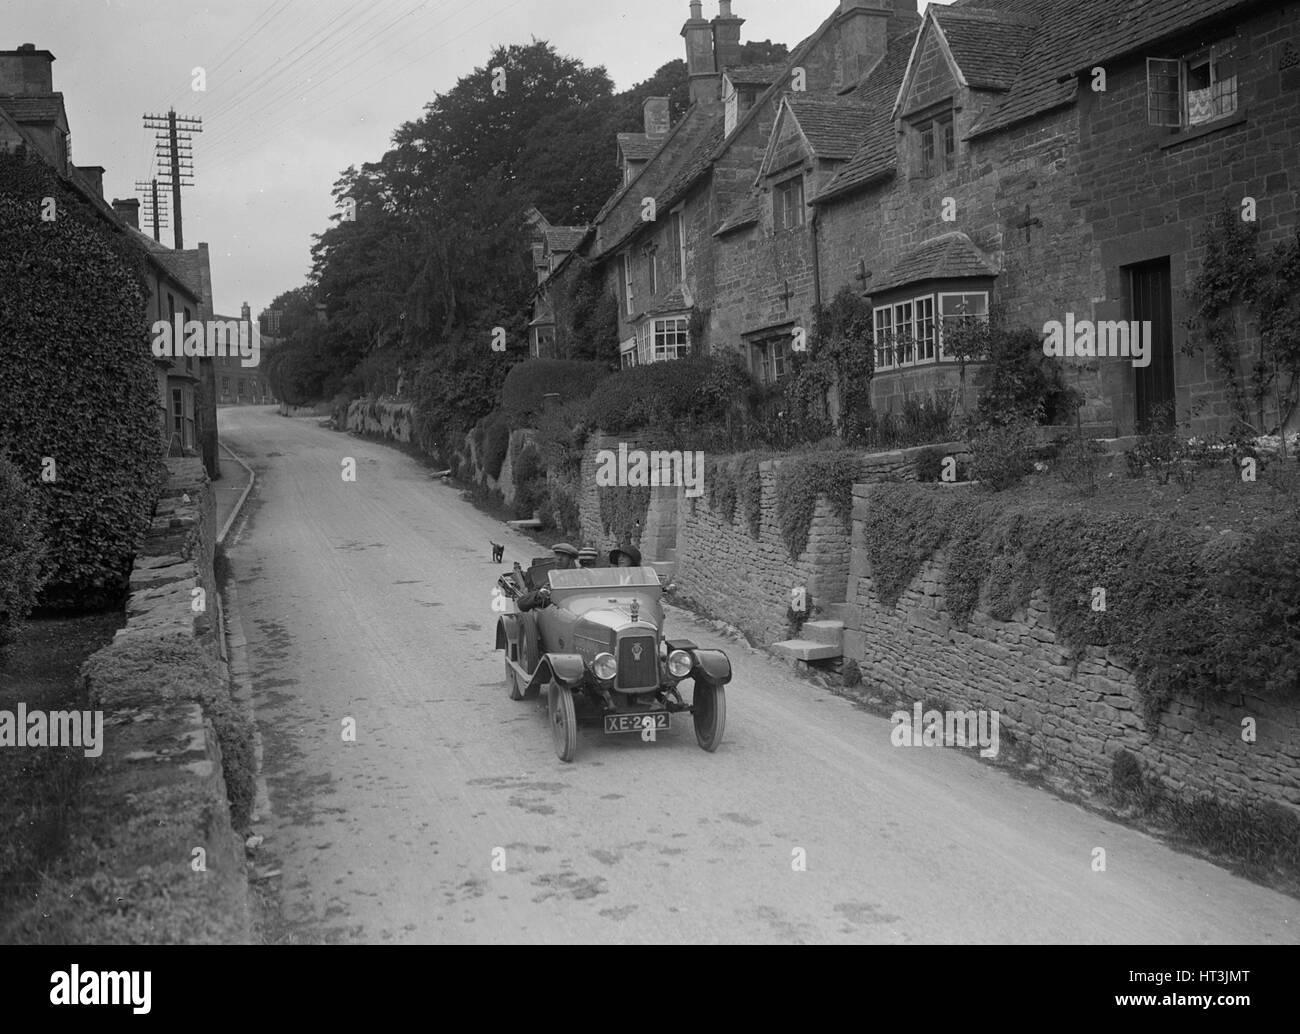 Calthorpe 4-seater tourer, Cotswolds, c1920s. Artist: Bill Brunell. - Stock Image